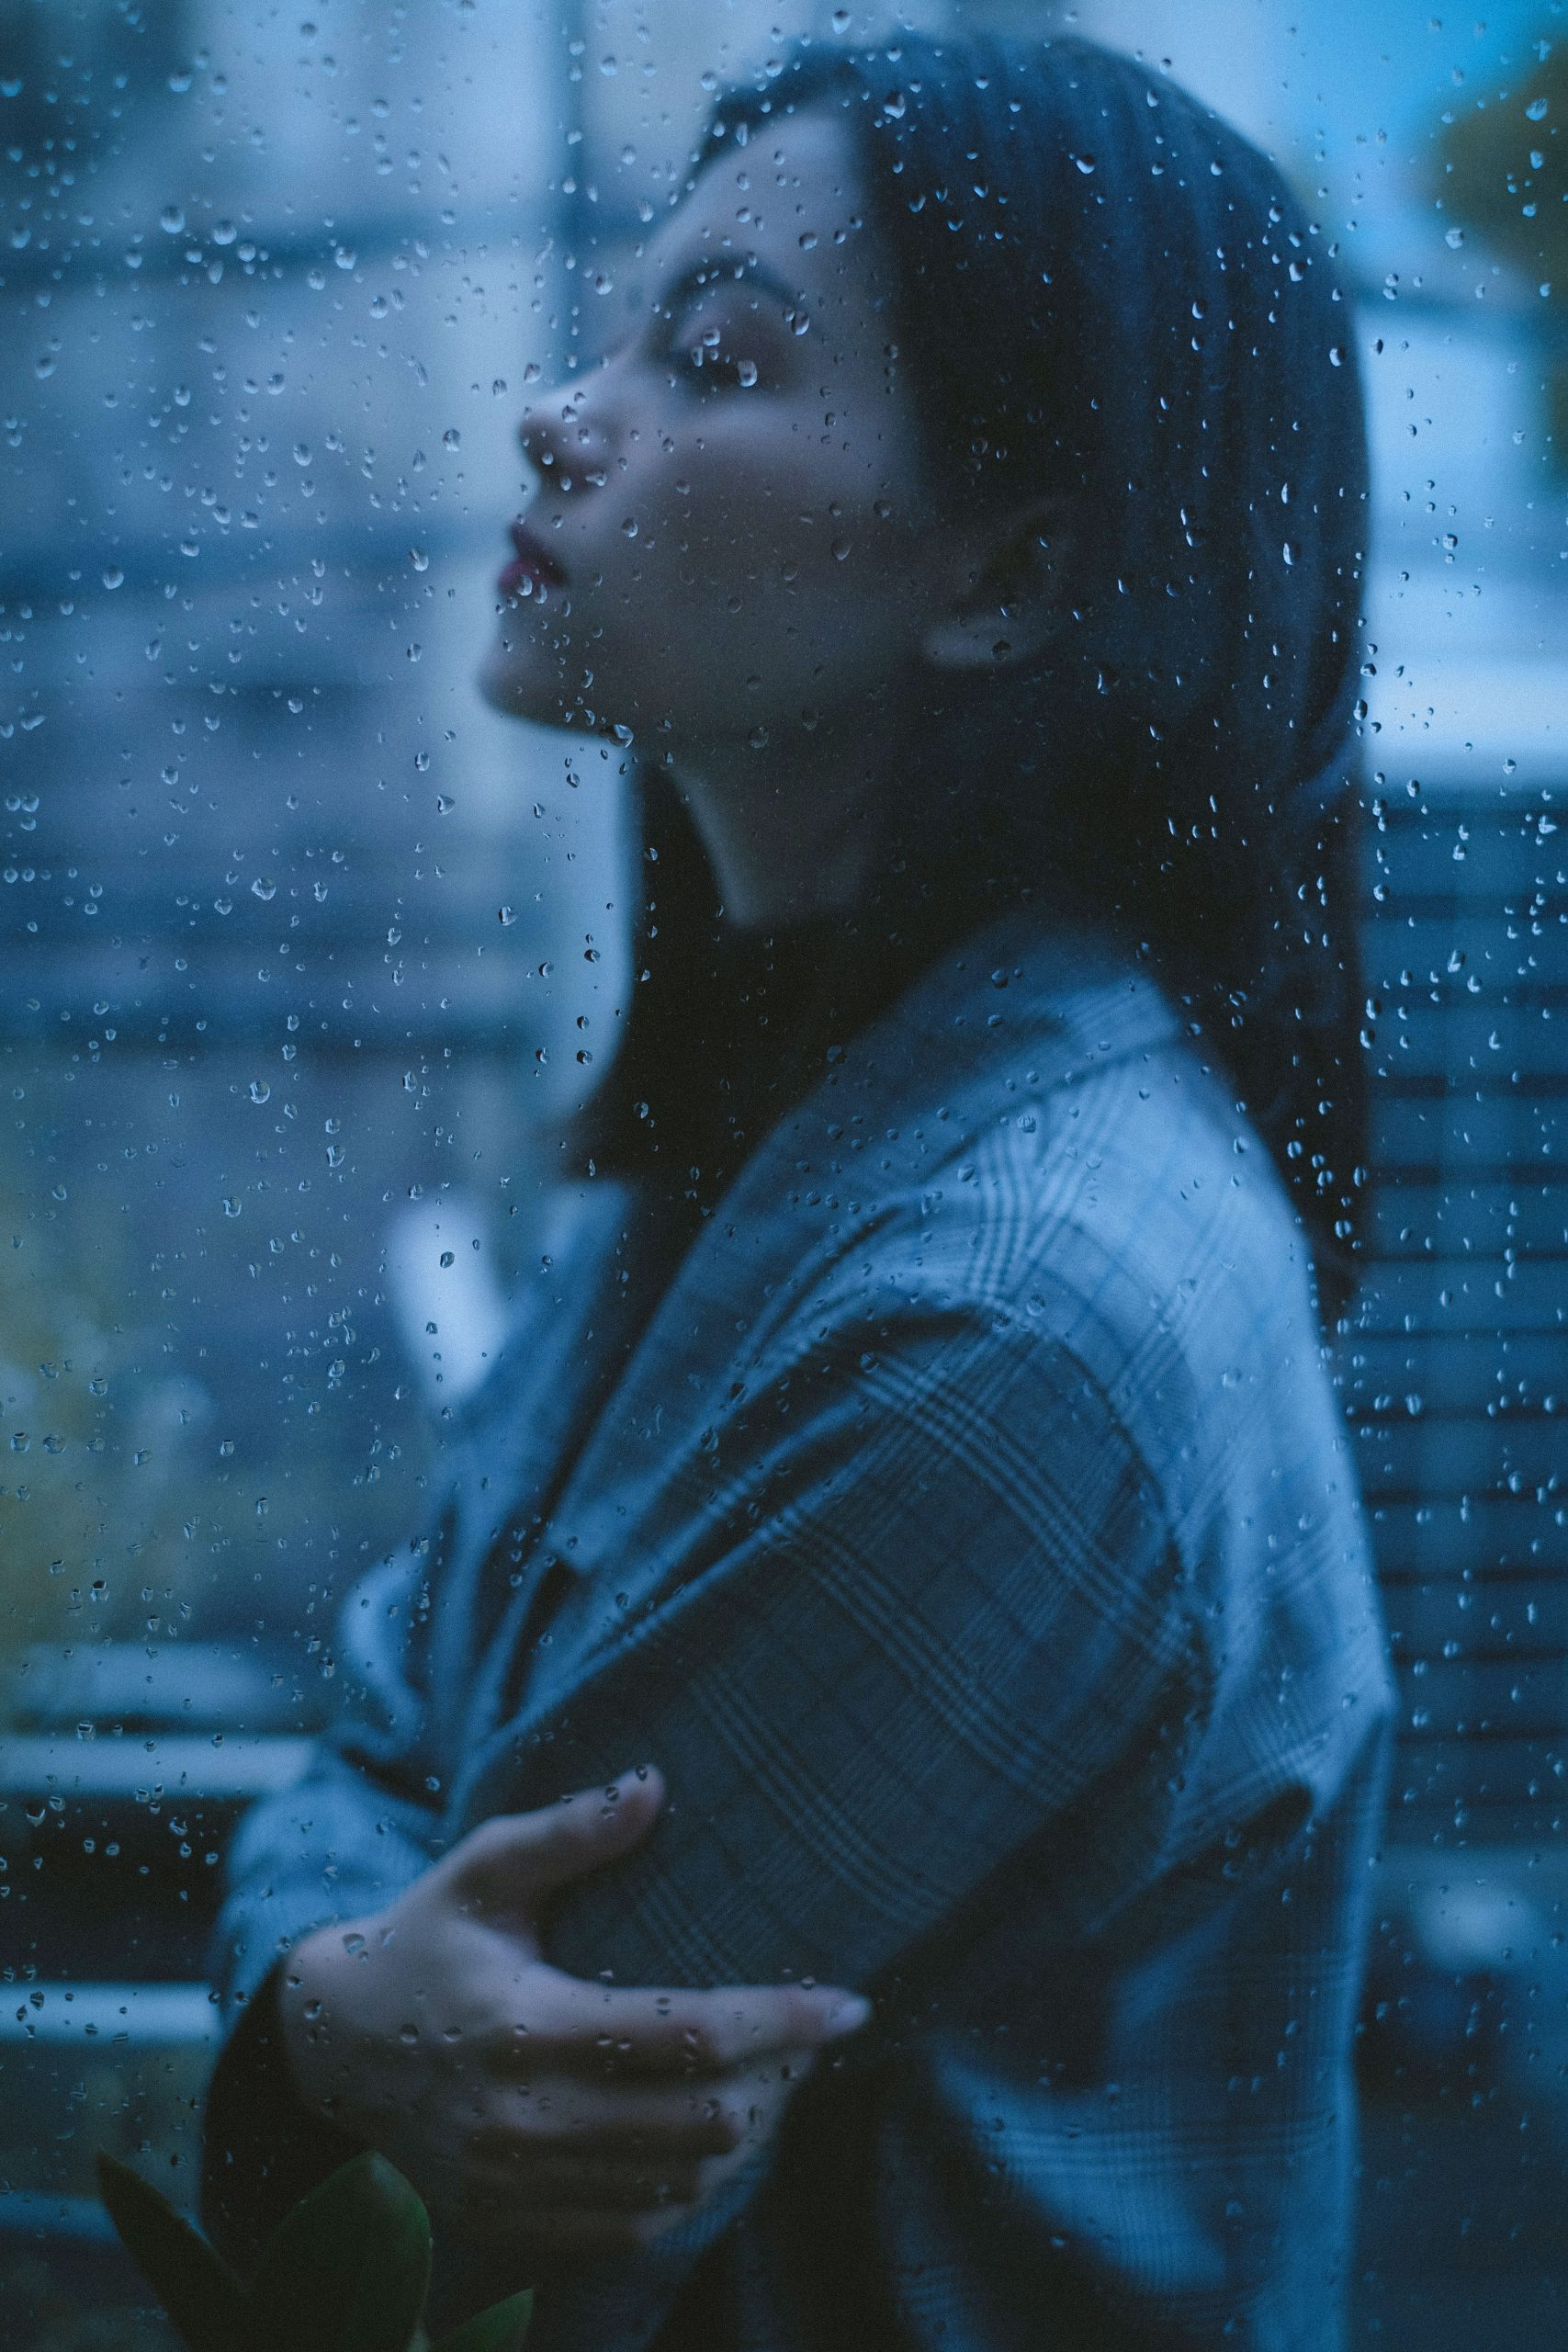 New Sad Girl Whatsapp Dp Images wallpaper 2021